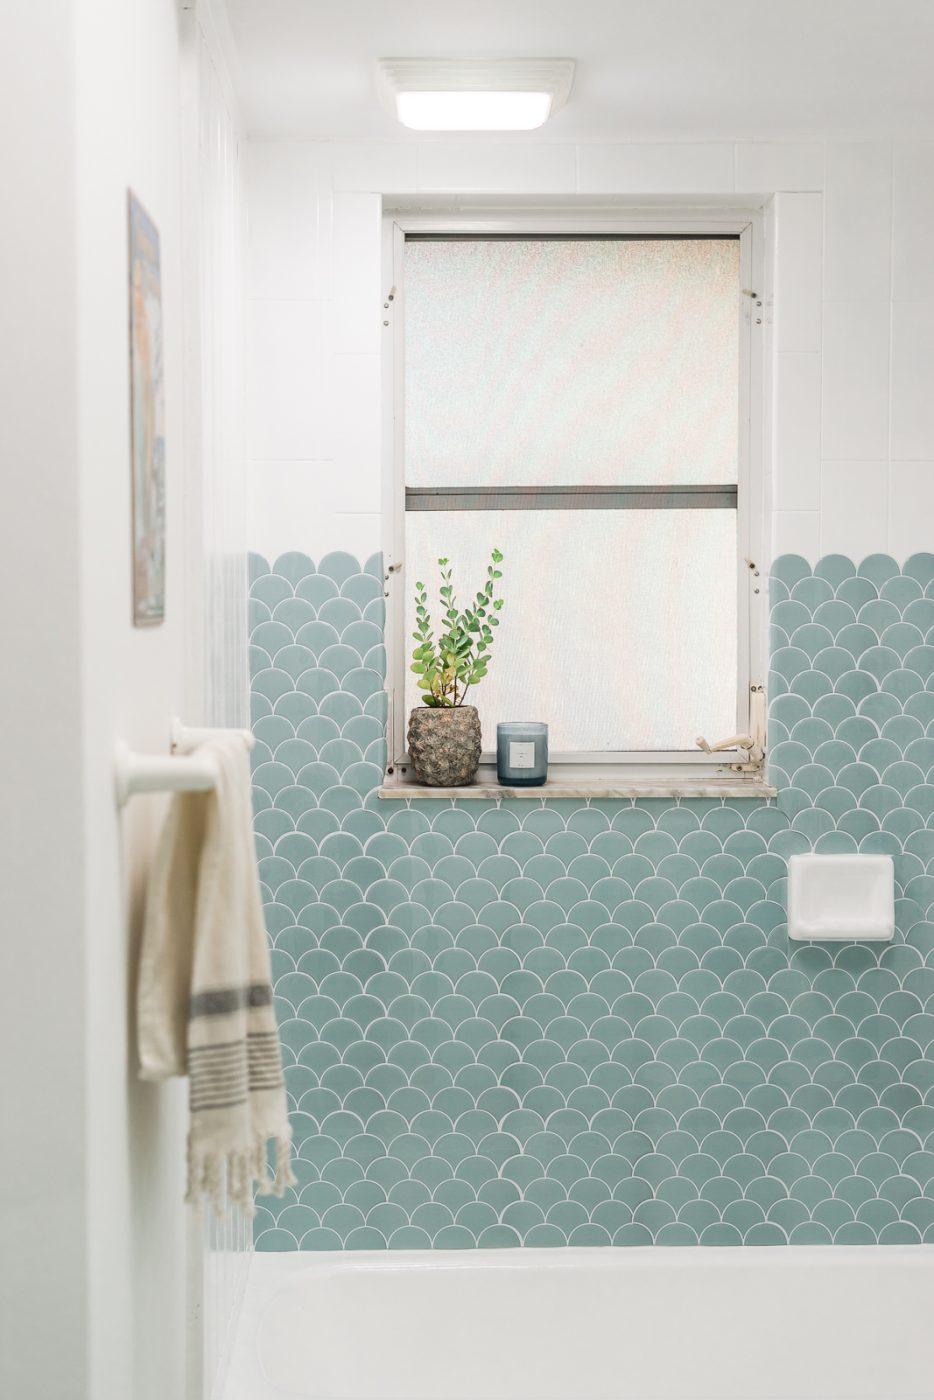 Diy Bathroom Remodel Under 500 Coastal Bathroom Decor Sweet Teal